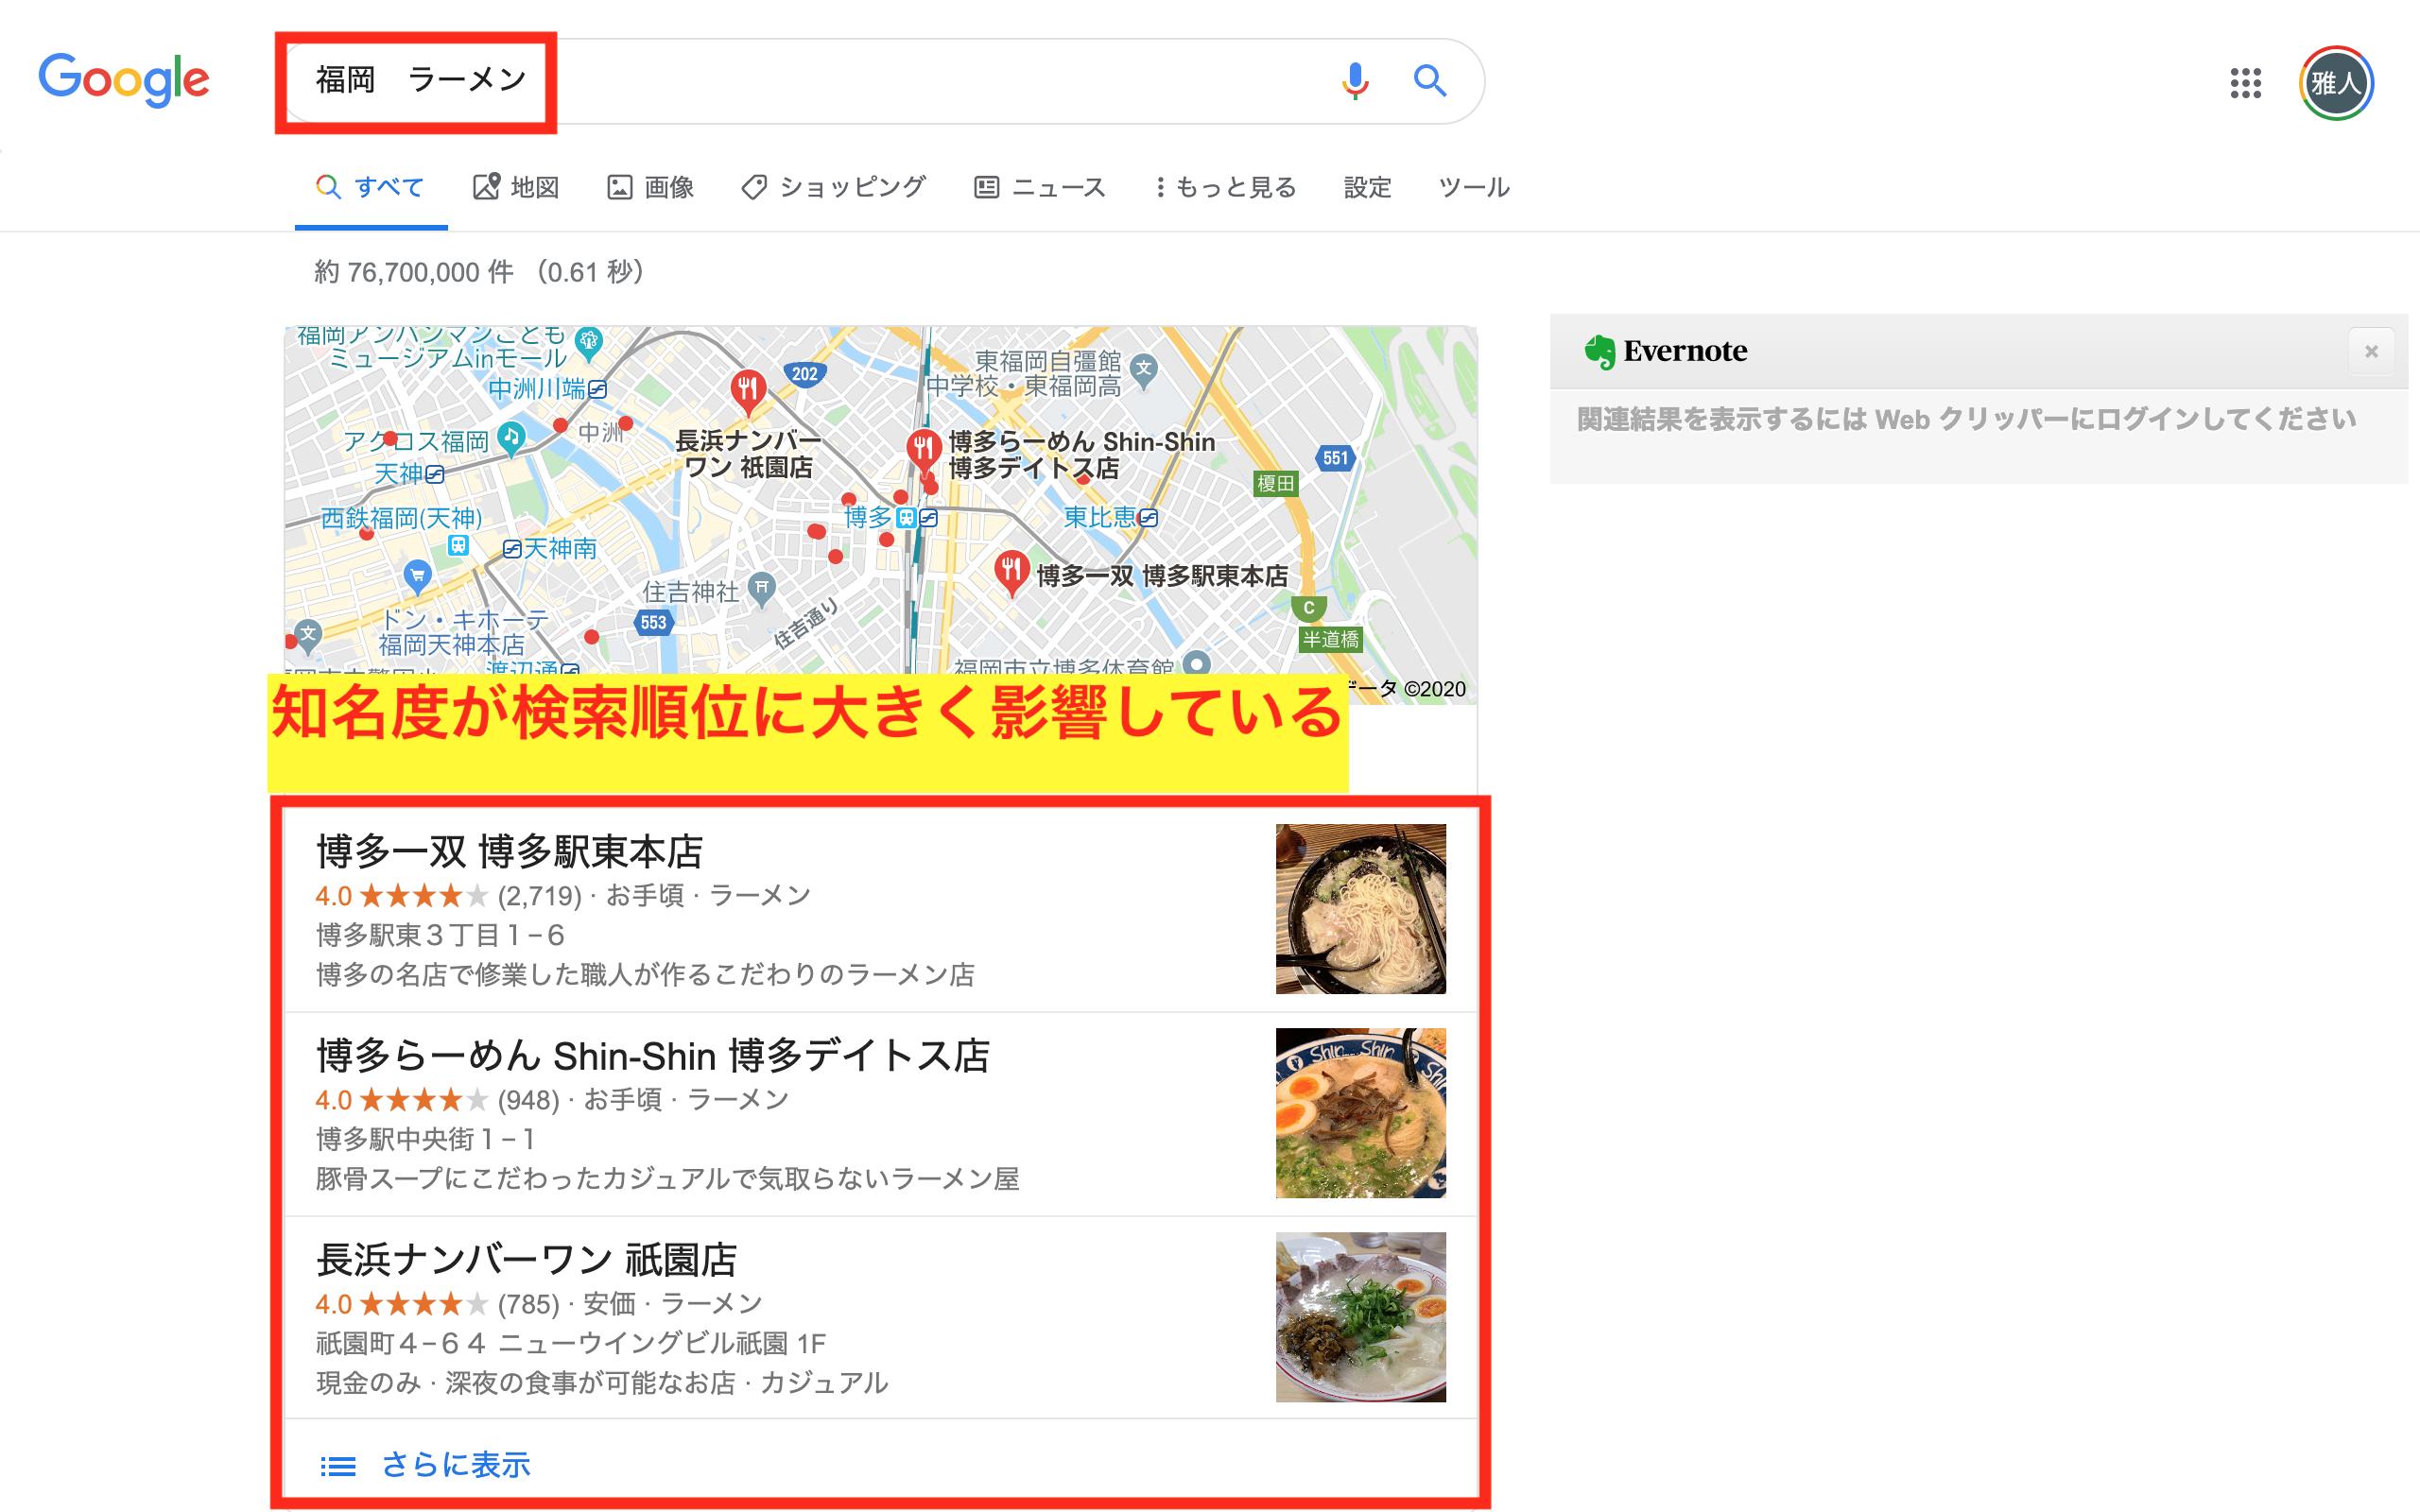 Google Maps 指標 知名度 サイテーション